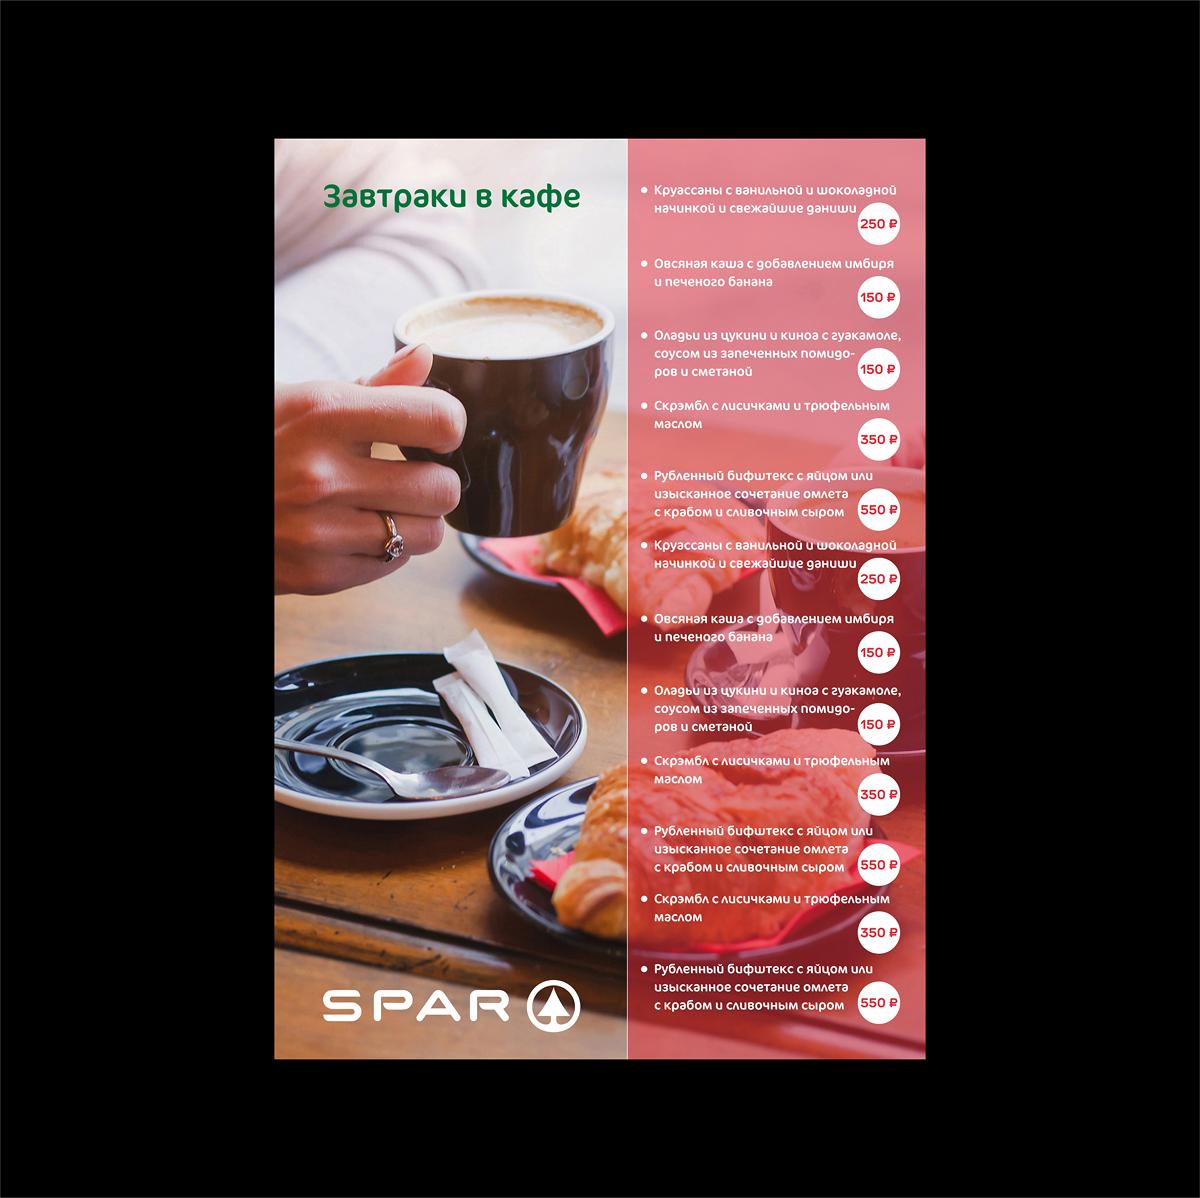 Дизайн листовки для магазина SPAR фото f_6905cb33a3db2ba2.jpg